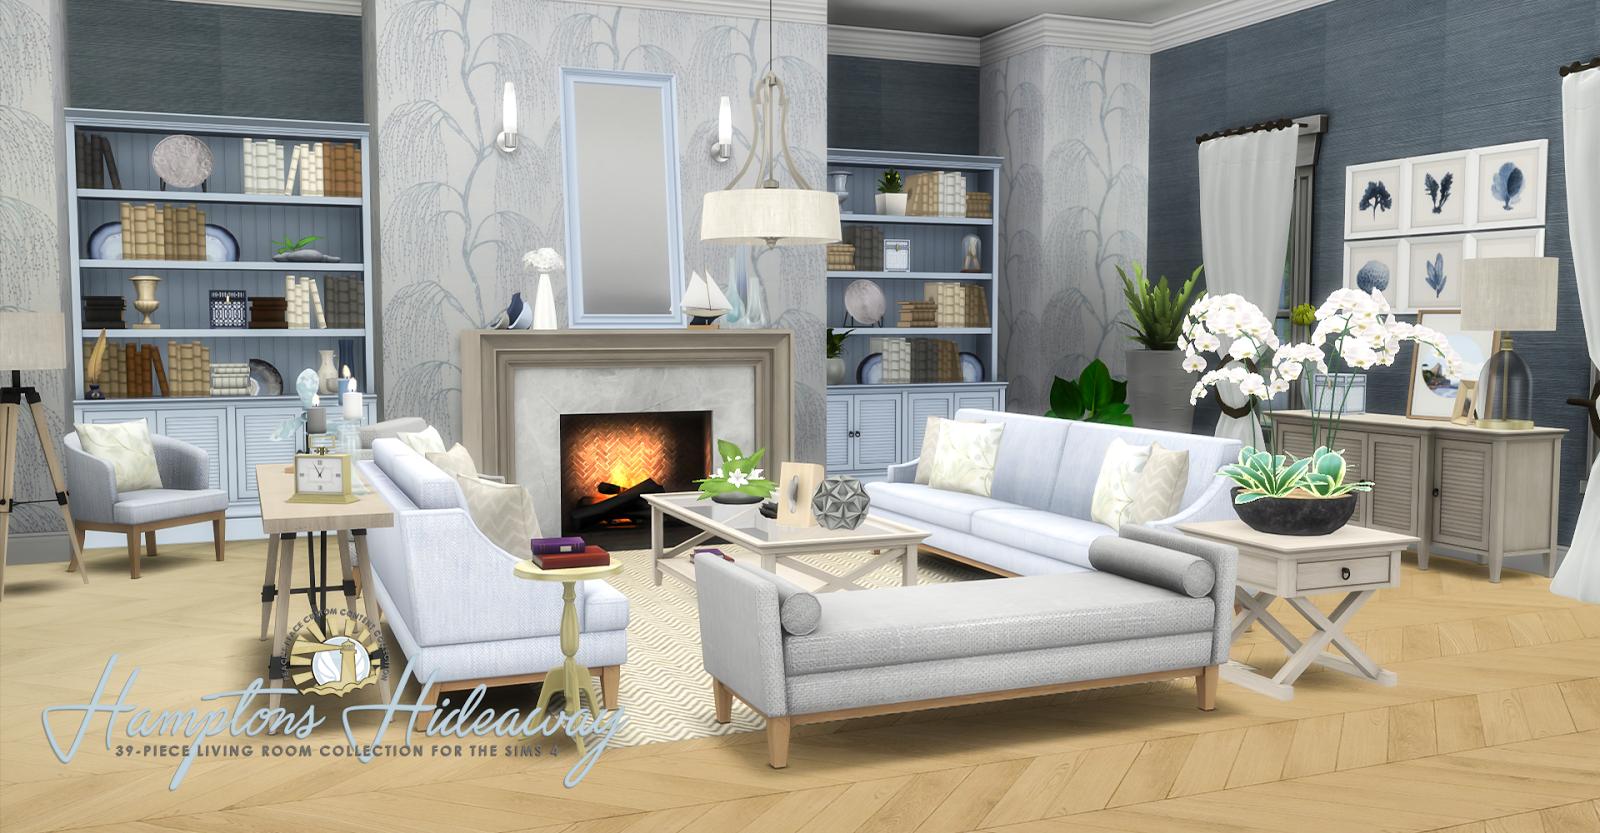 Simsational Designs: Hamptons Hideaway - Living Room Set ...